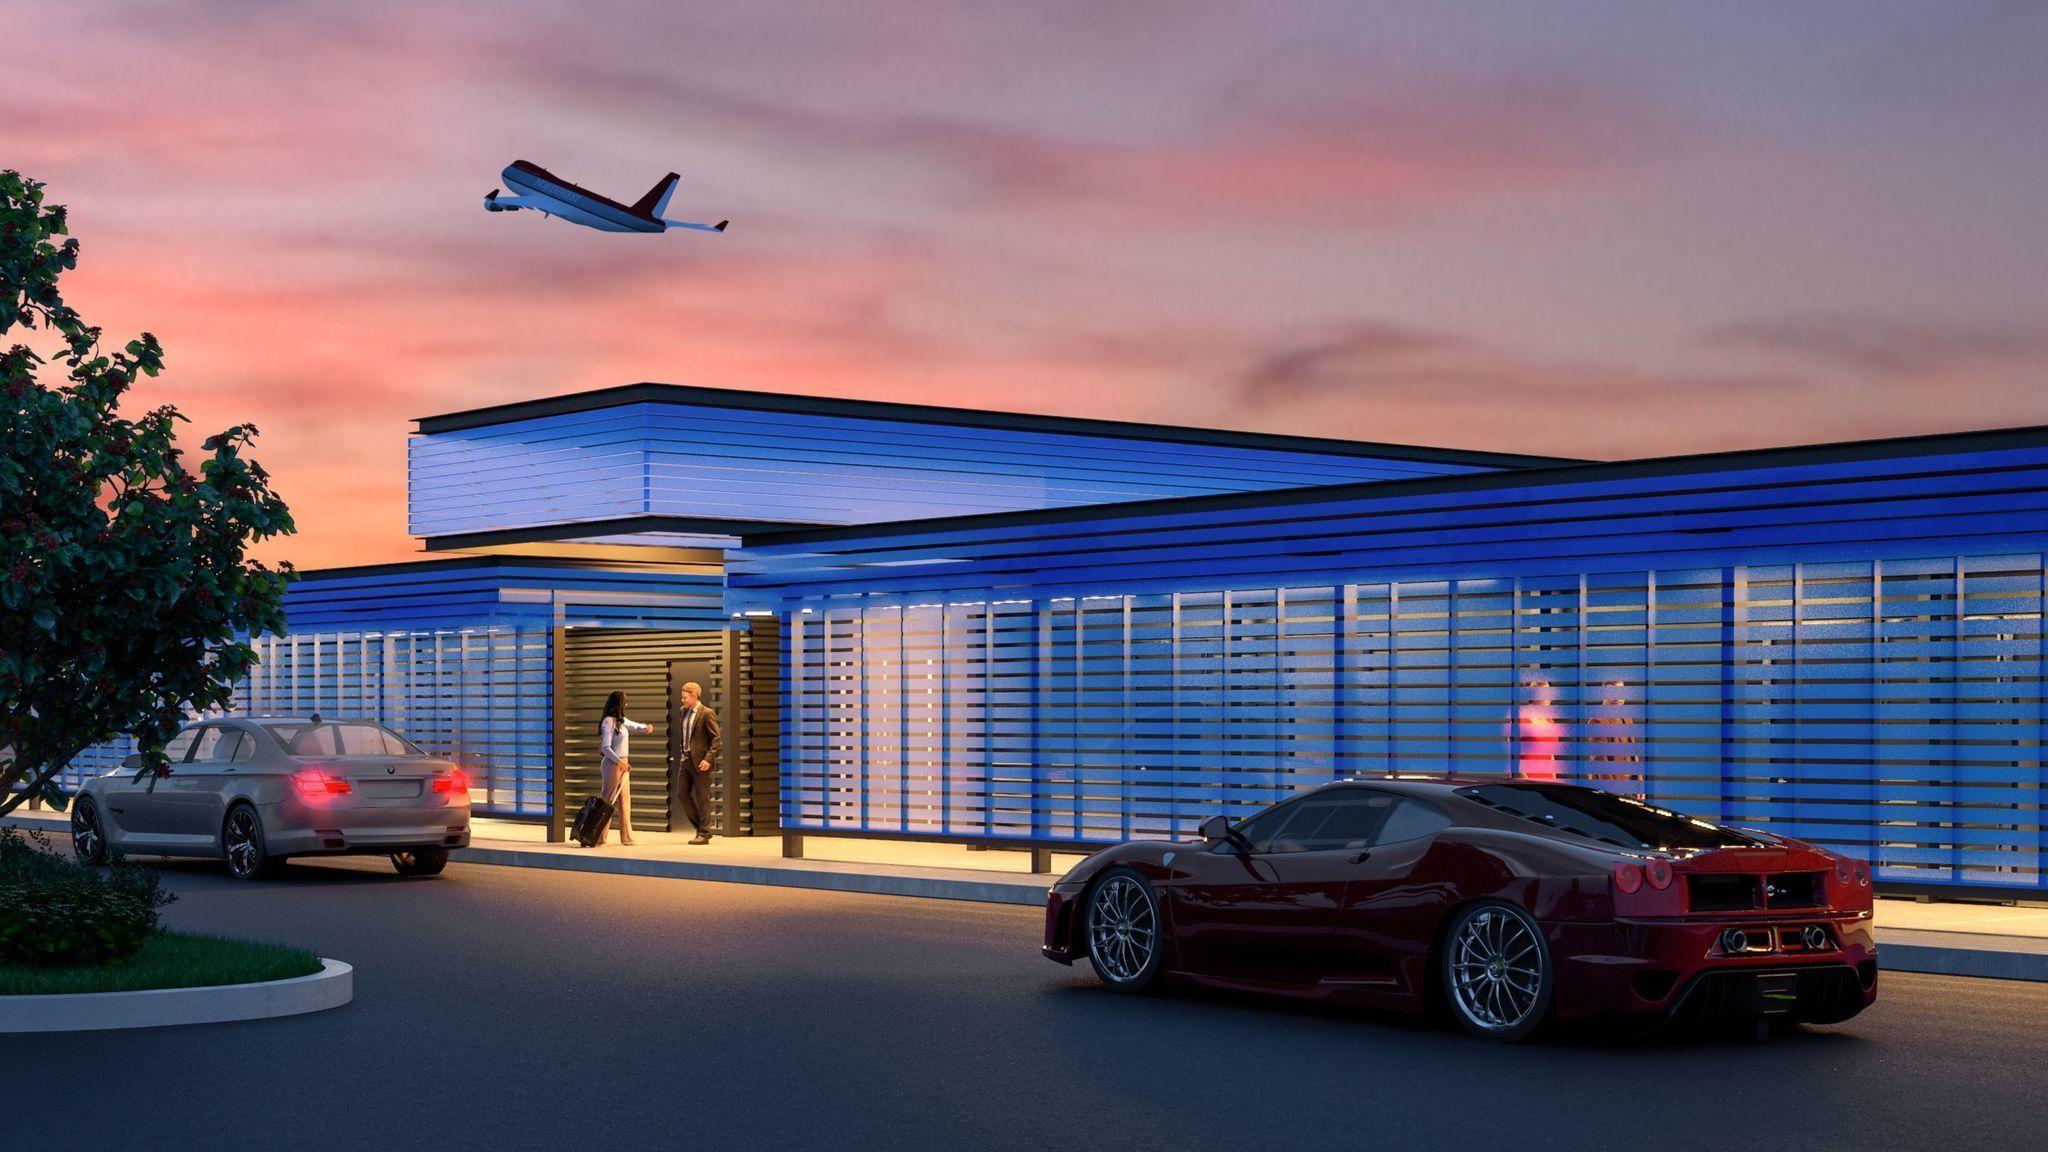 LAX - The Private Suite